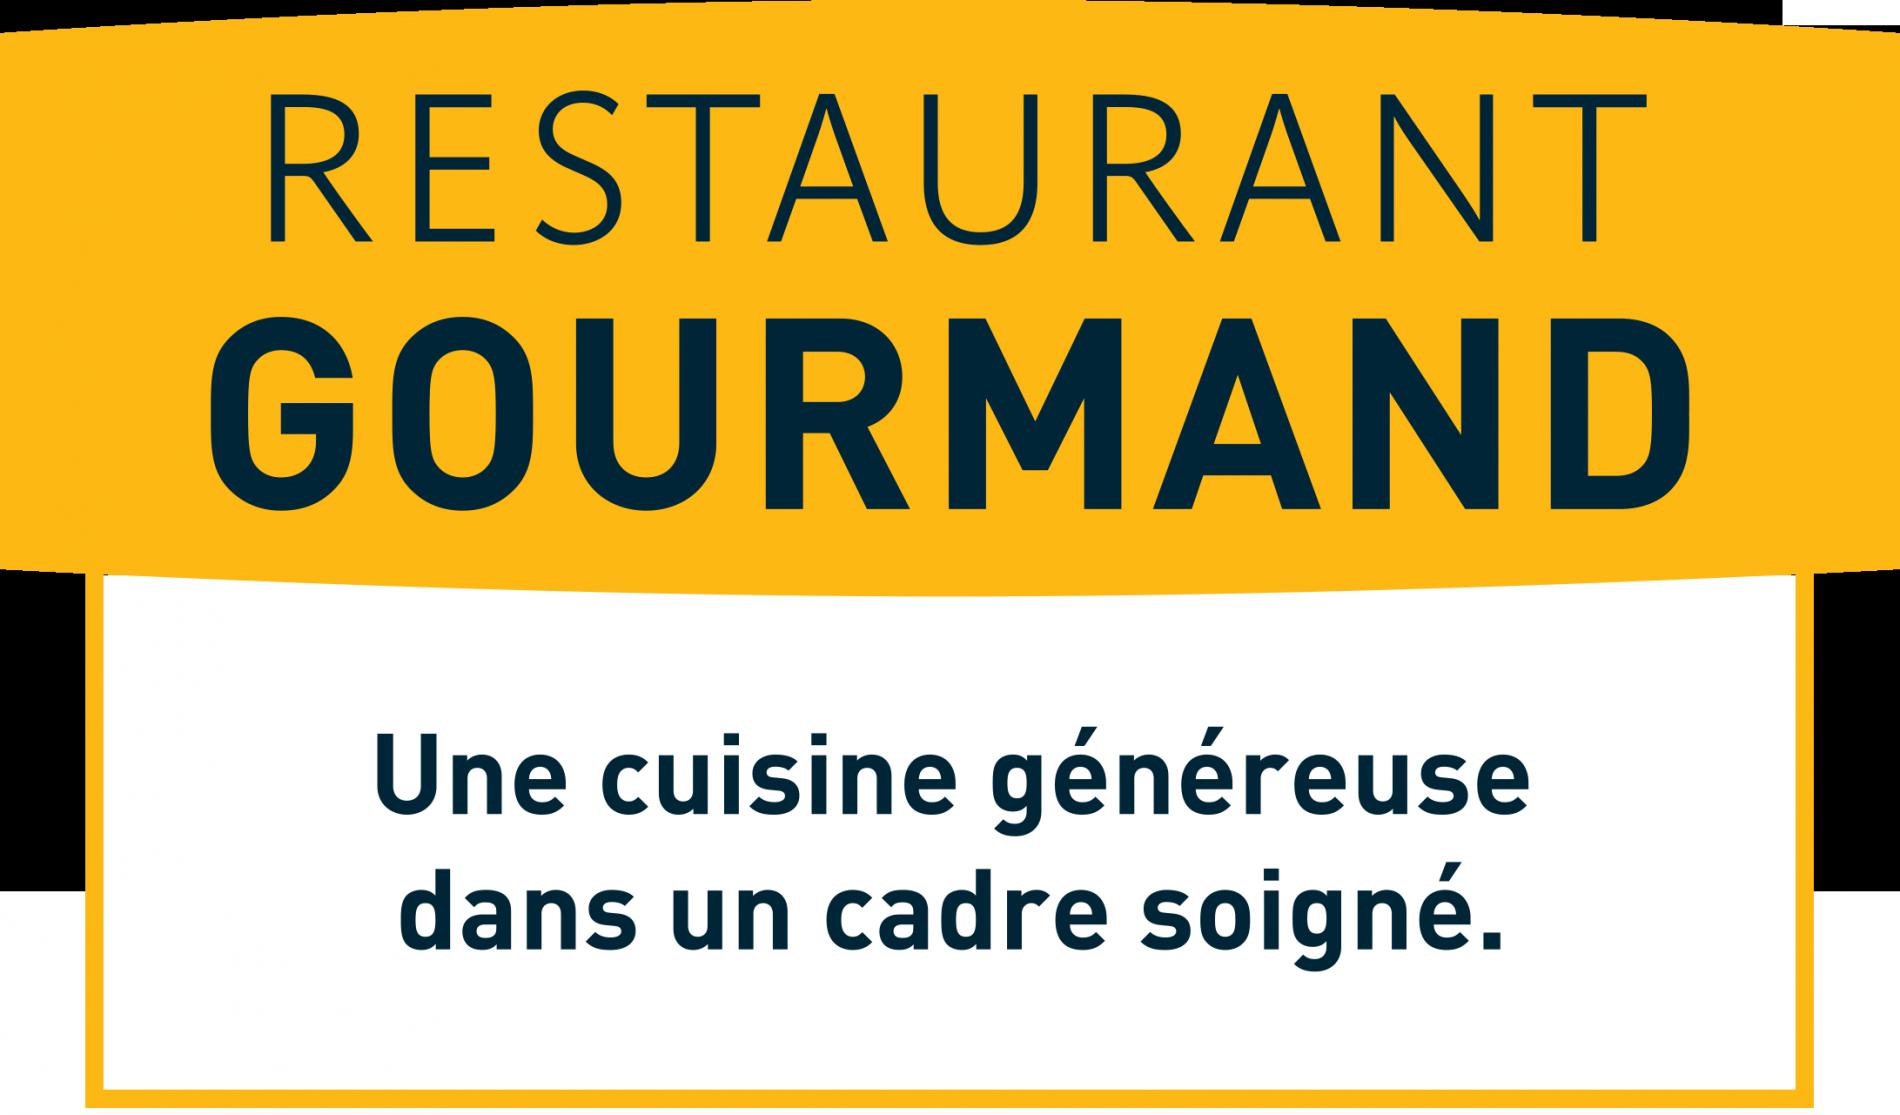 Logis Restaurant Gourmand